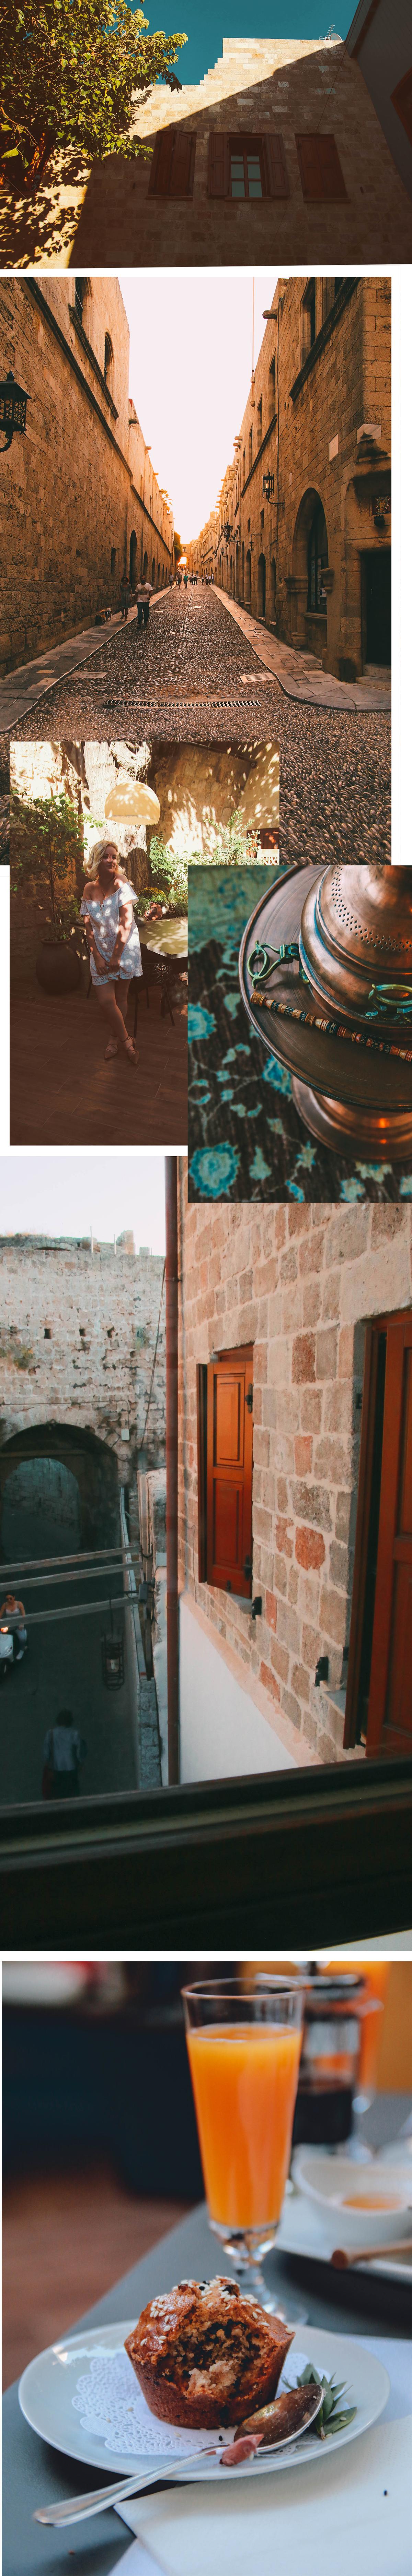 blog_lina_mallon_rhodos_traveldiary (47 von 65)